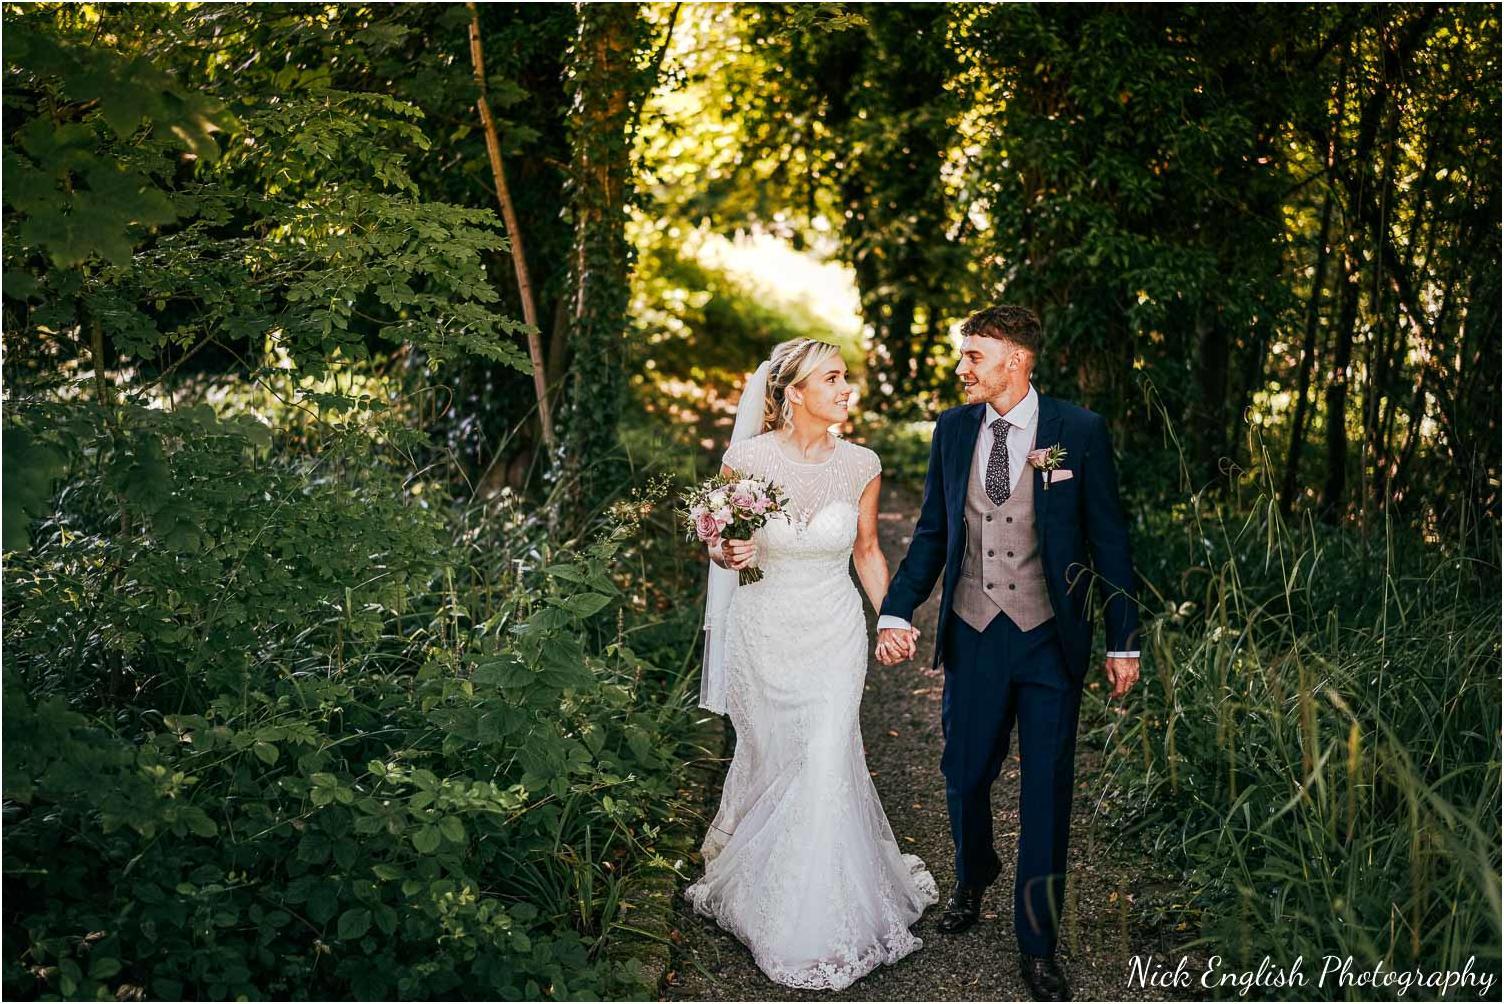 Mitton_Hall_Wedding_Photograph-100.jpg